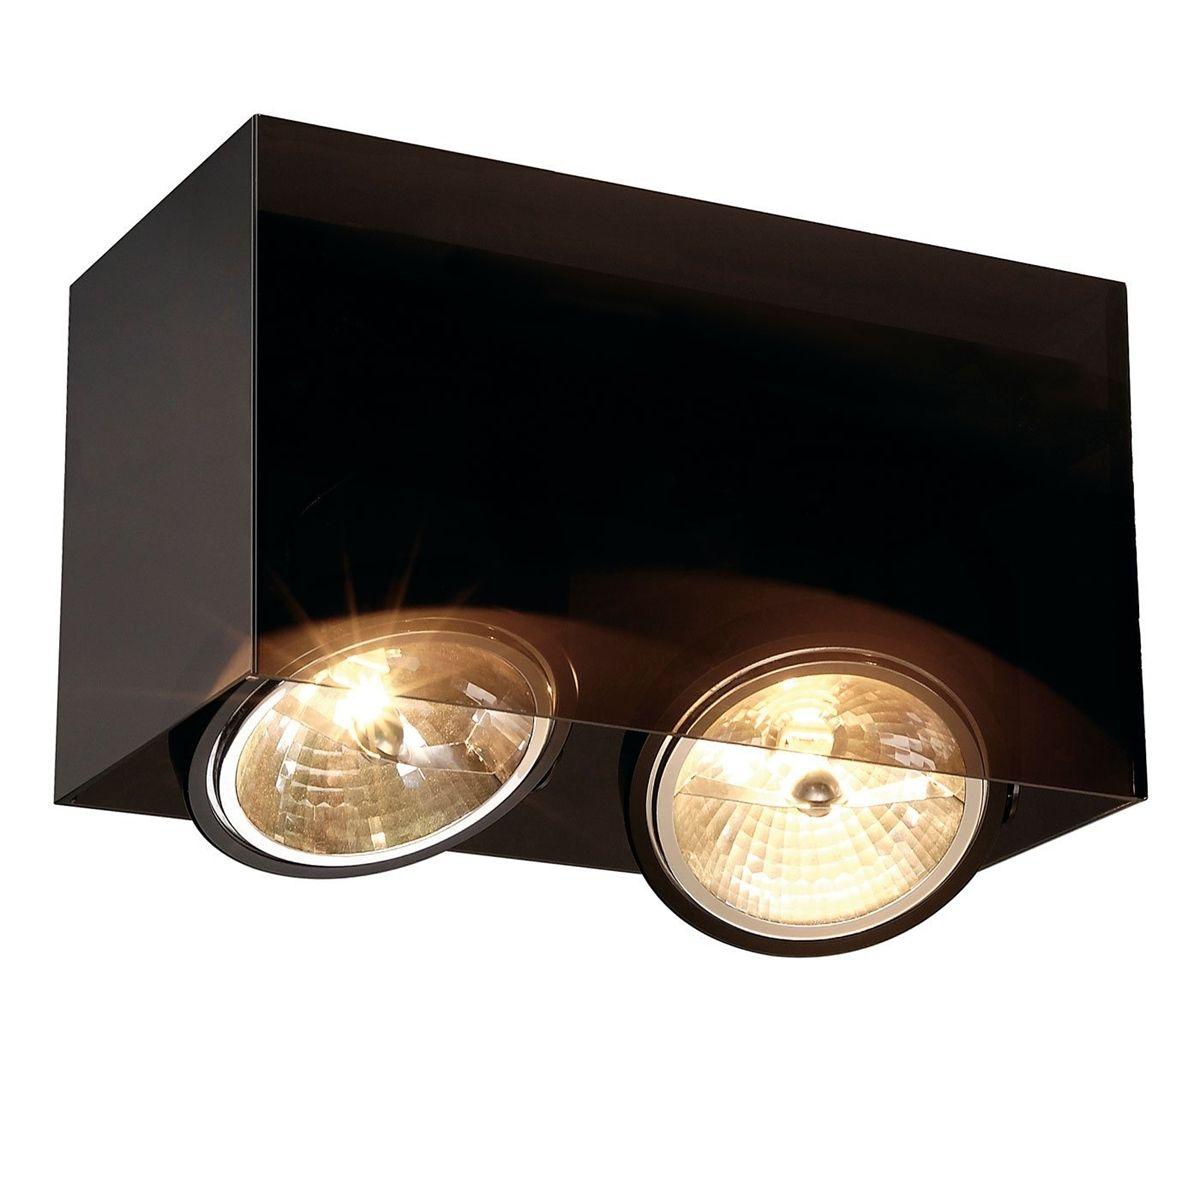 SLV Lighting Acrylic Box double AR111 | SLV Ceiling Luminaire ... for Ceiling Double Spot Light  199fiz